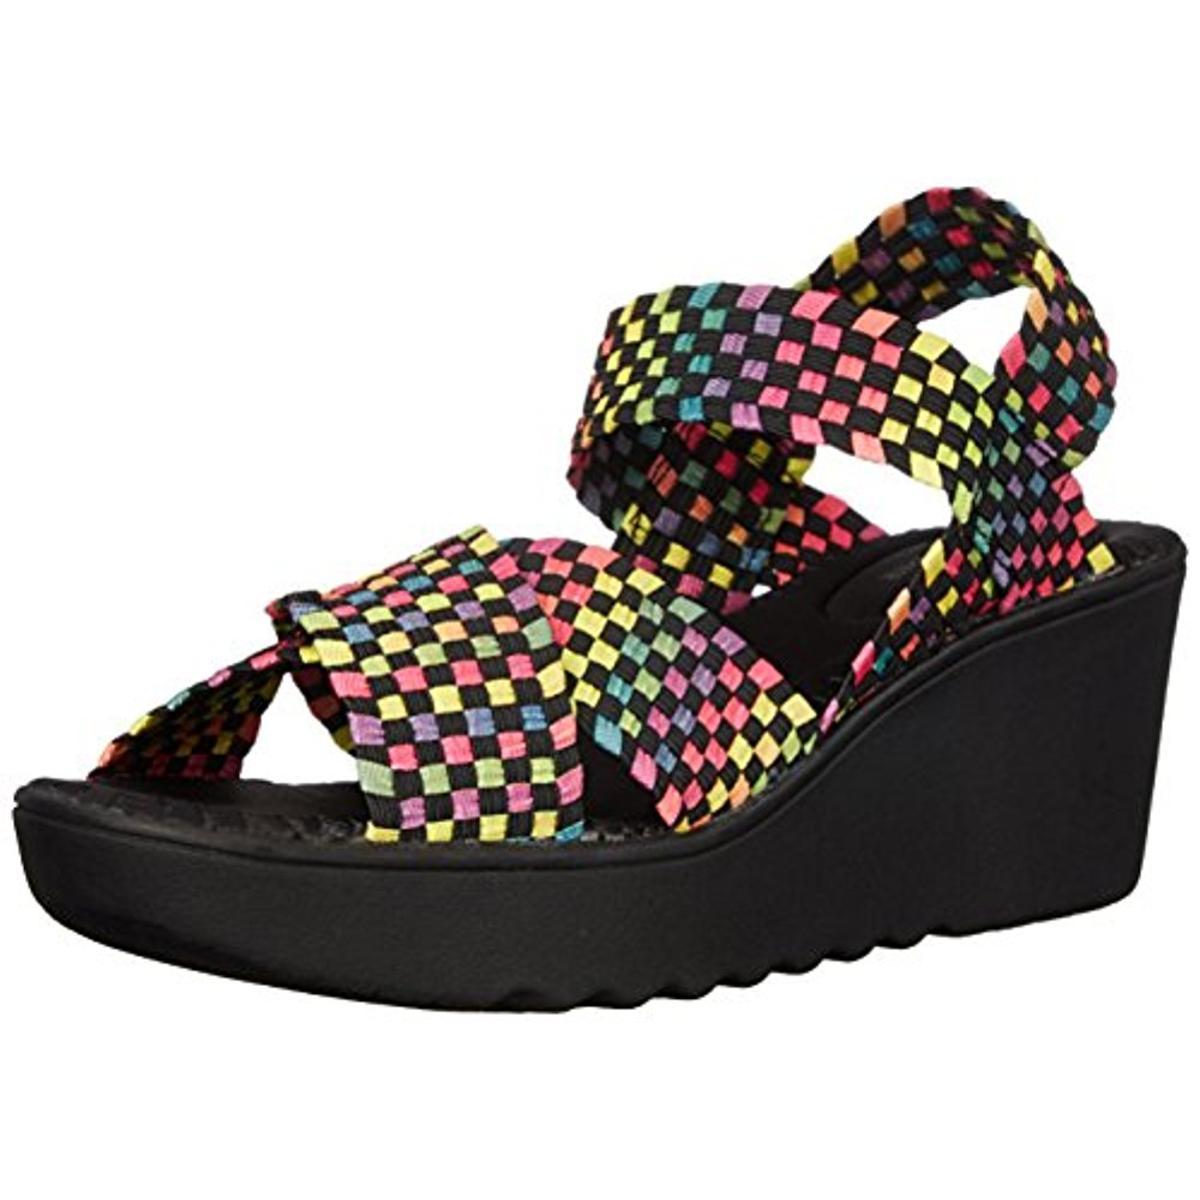 wild pair 9039 womens fortuna basket weave strappy slip on wedges sandals bhfo ebay. Black Bedroom Furniture Sets. Home Design Ideas